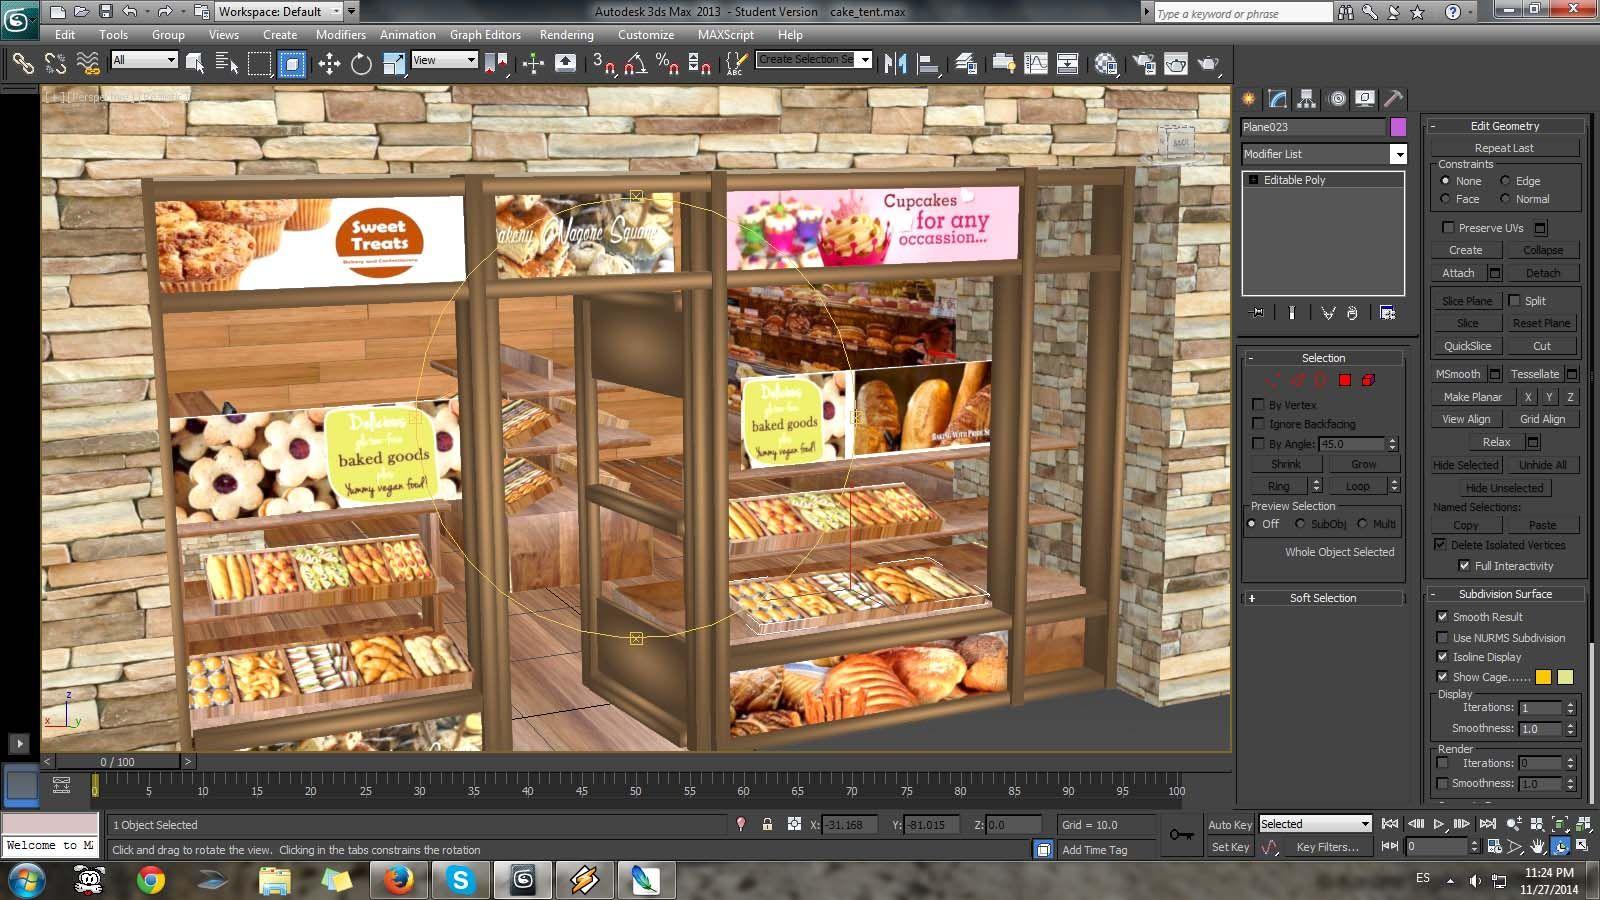 Bakery 1.0 pic2 city enviroment